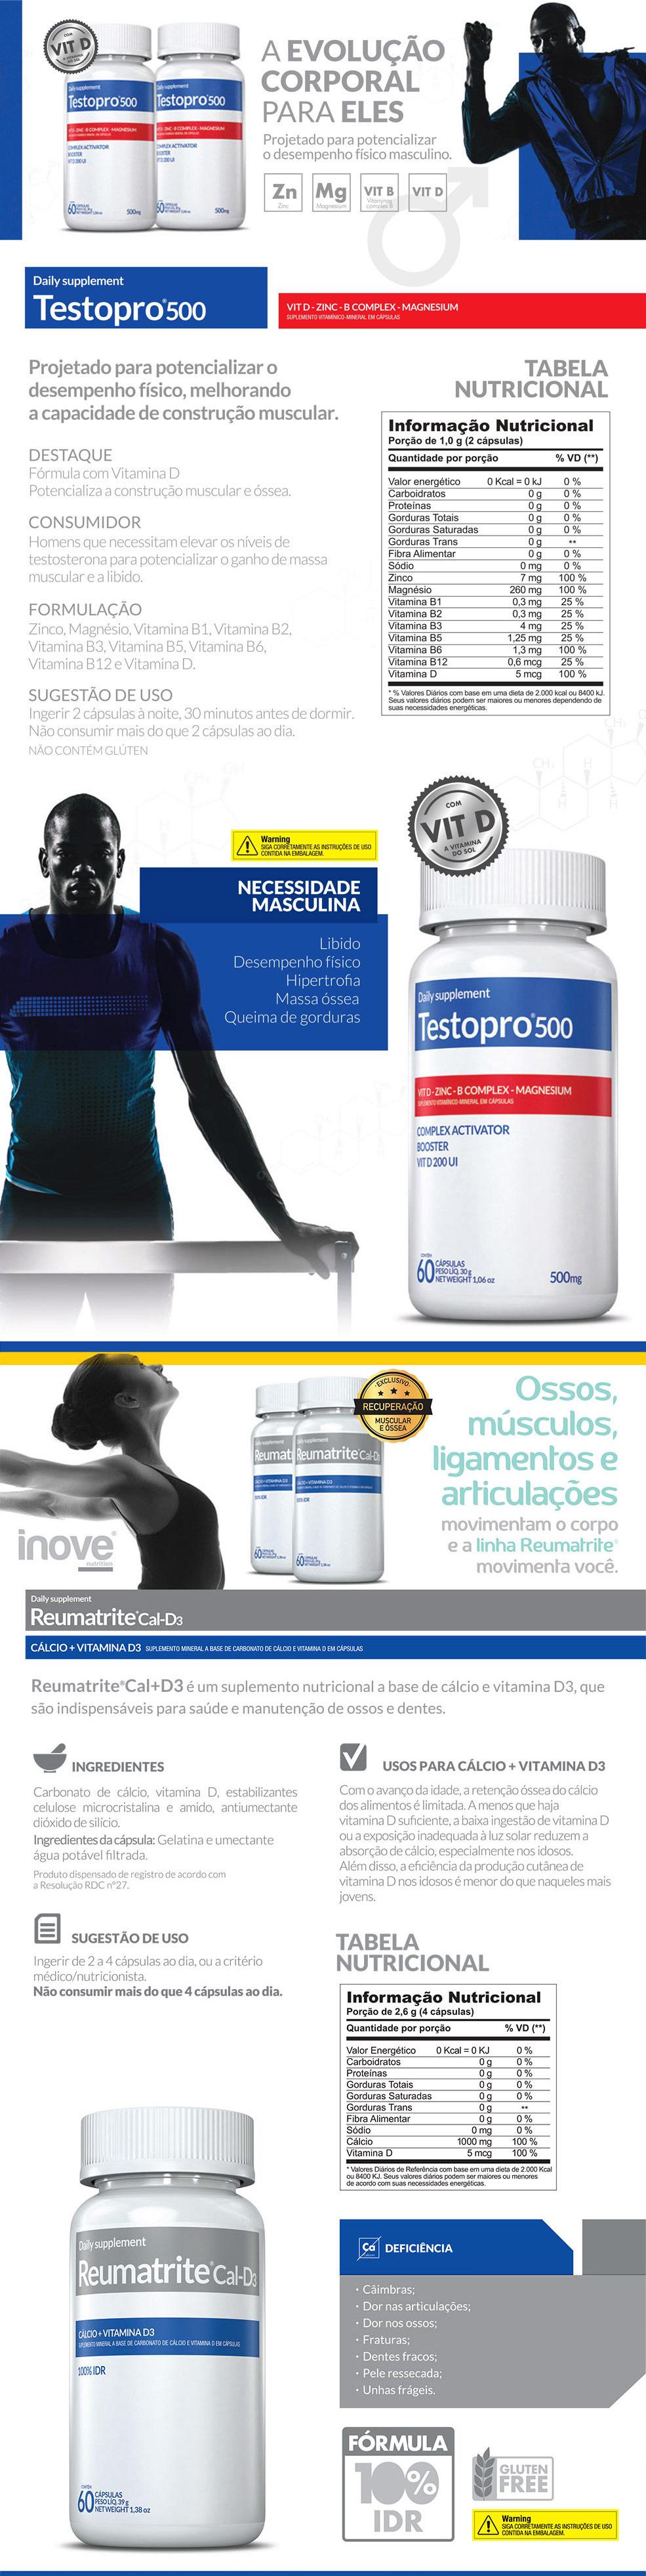 TestoPro® 500 + Reumatrite® Cal-D3 + Squeeze Inove Nutrition